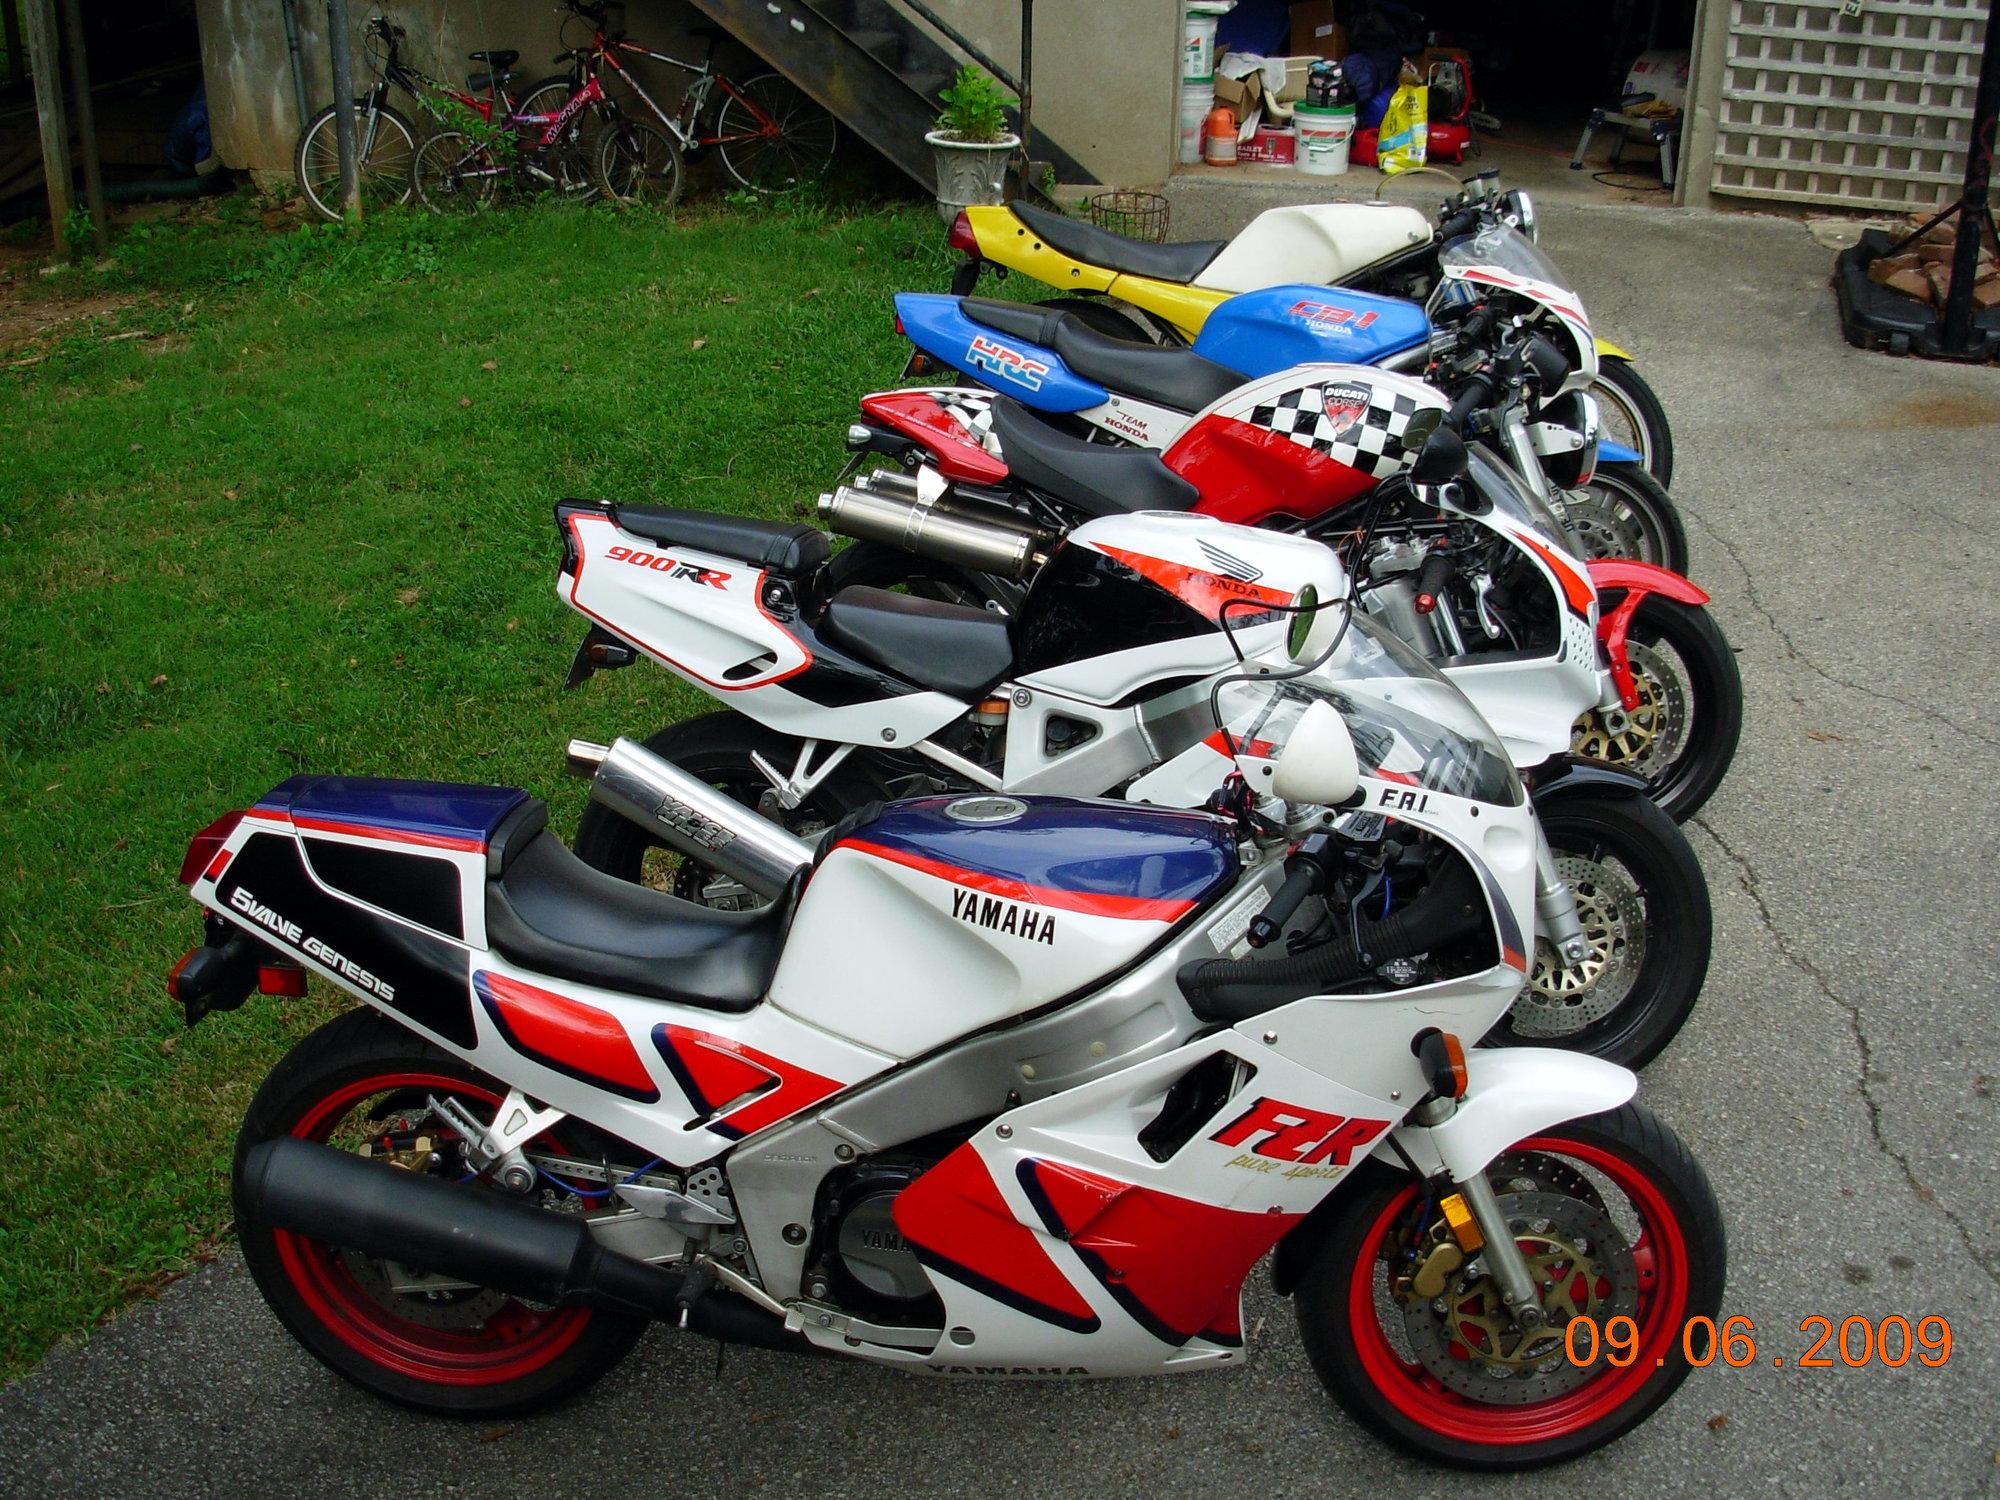 bikes 2009.jpg